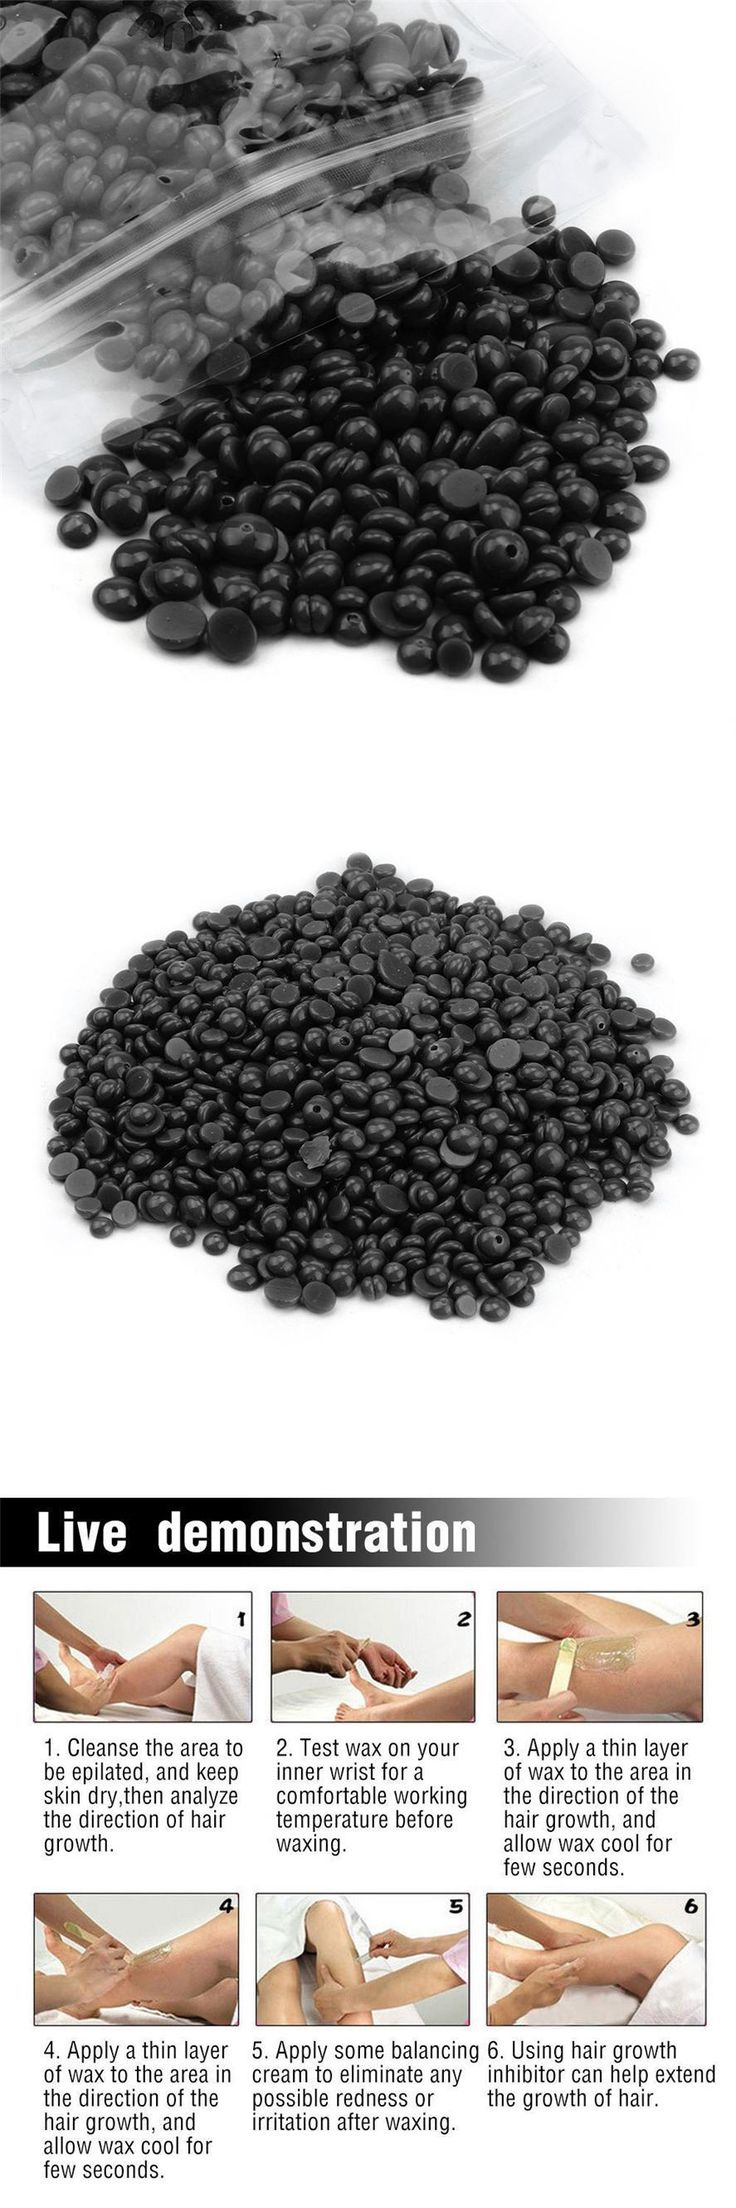 [Visit to Buy] 50g/1PC Depilatory Wax Coffee flavor No Strip Hair Removal Bean Depilatory Hot Film Hard Wax Pellet Waxing Bikini Depilatory Wax #Advertisement